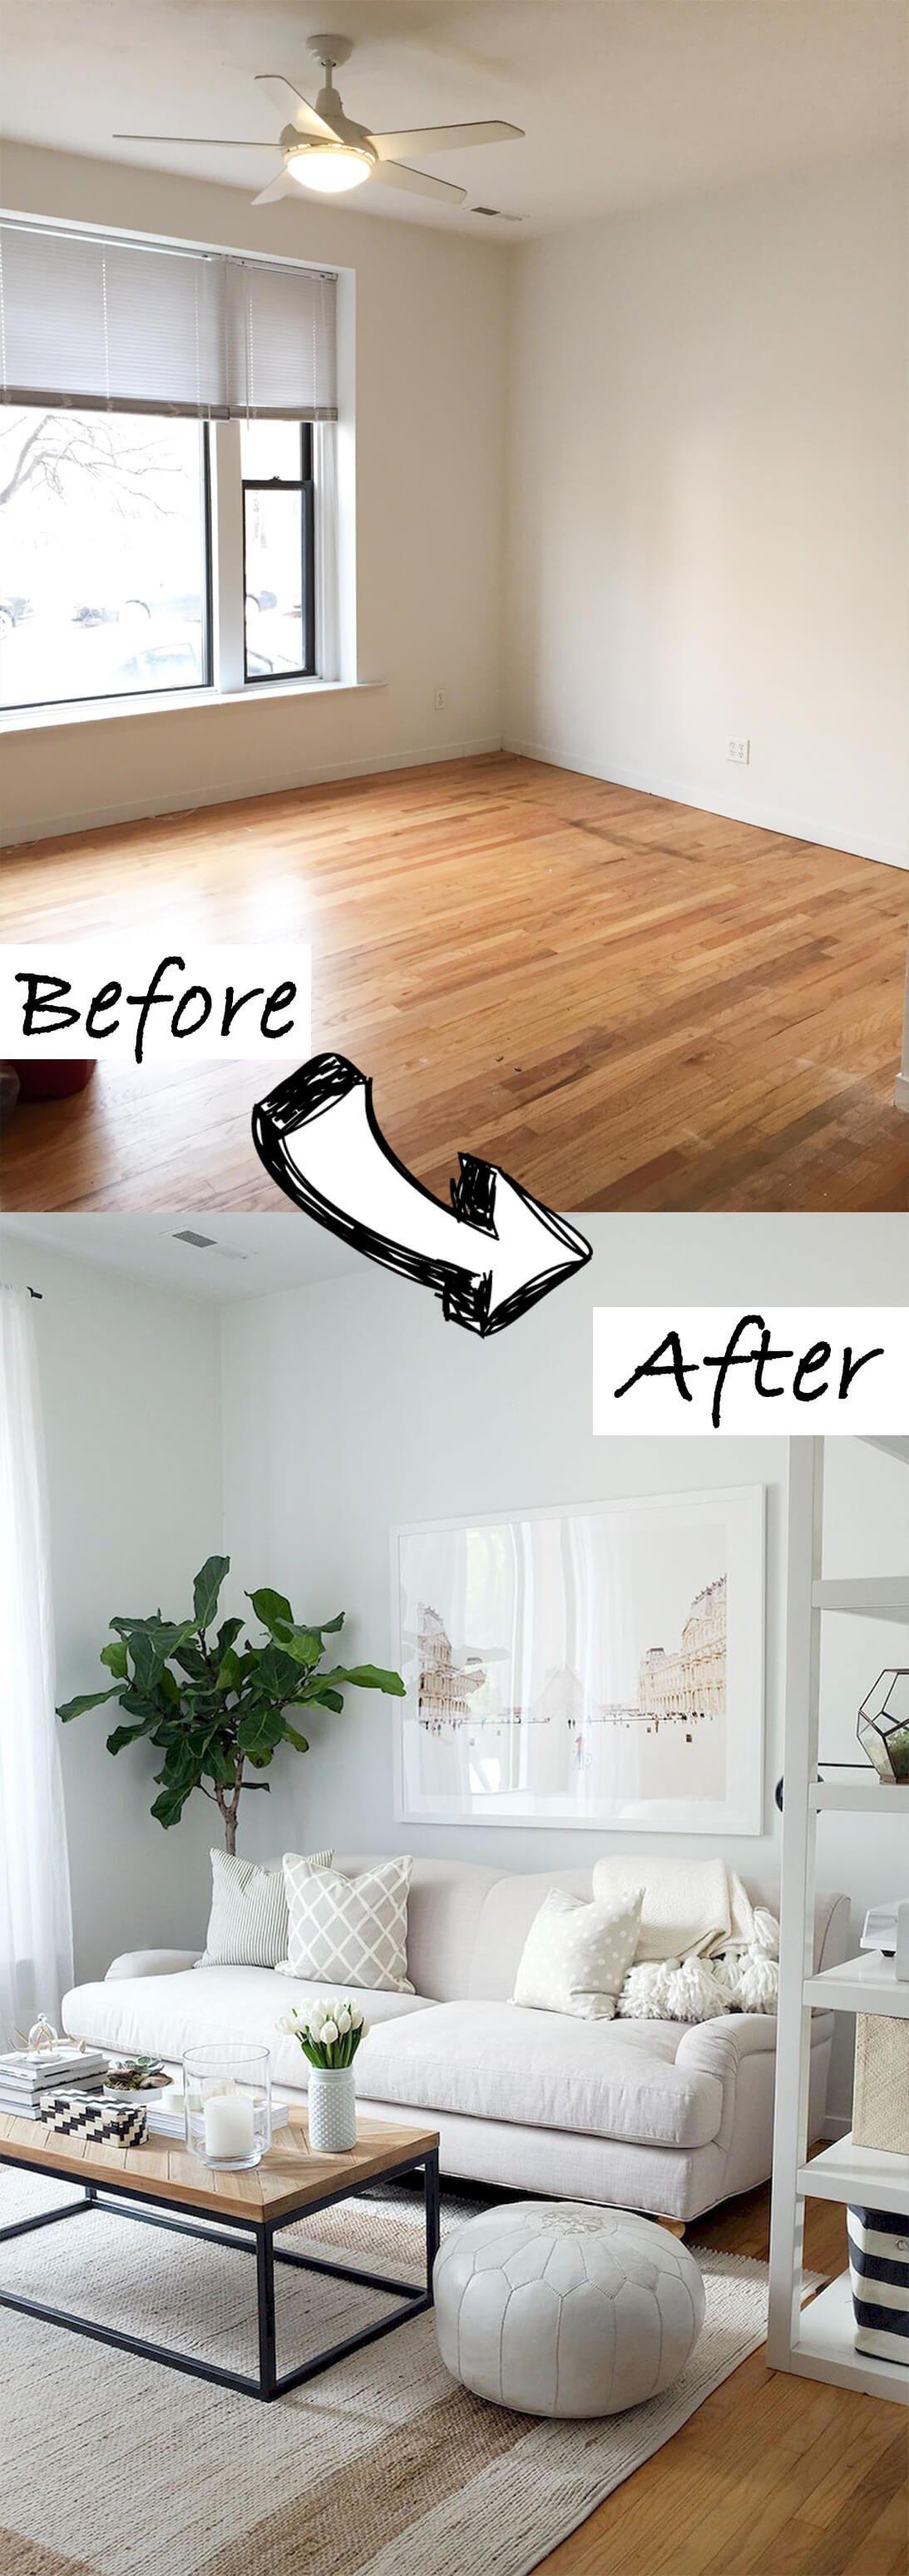 Small Living Room Makeover Ideas Elegant 26 Best Bud Friendly Living Room Makeover Ideas for 2019